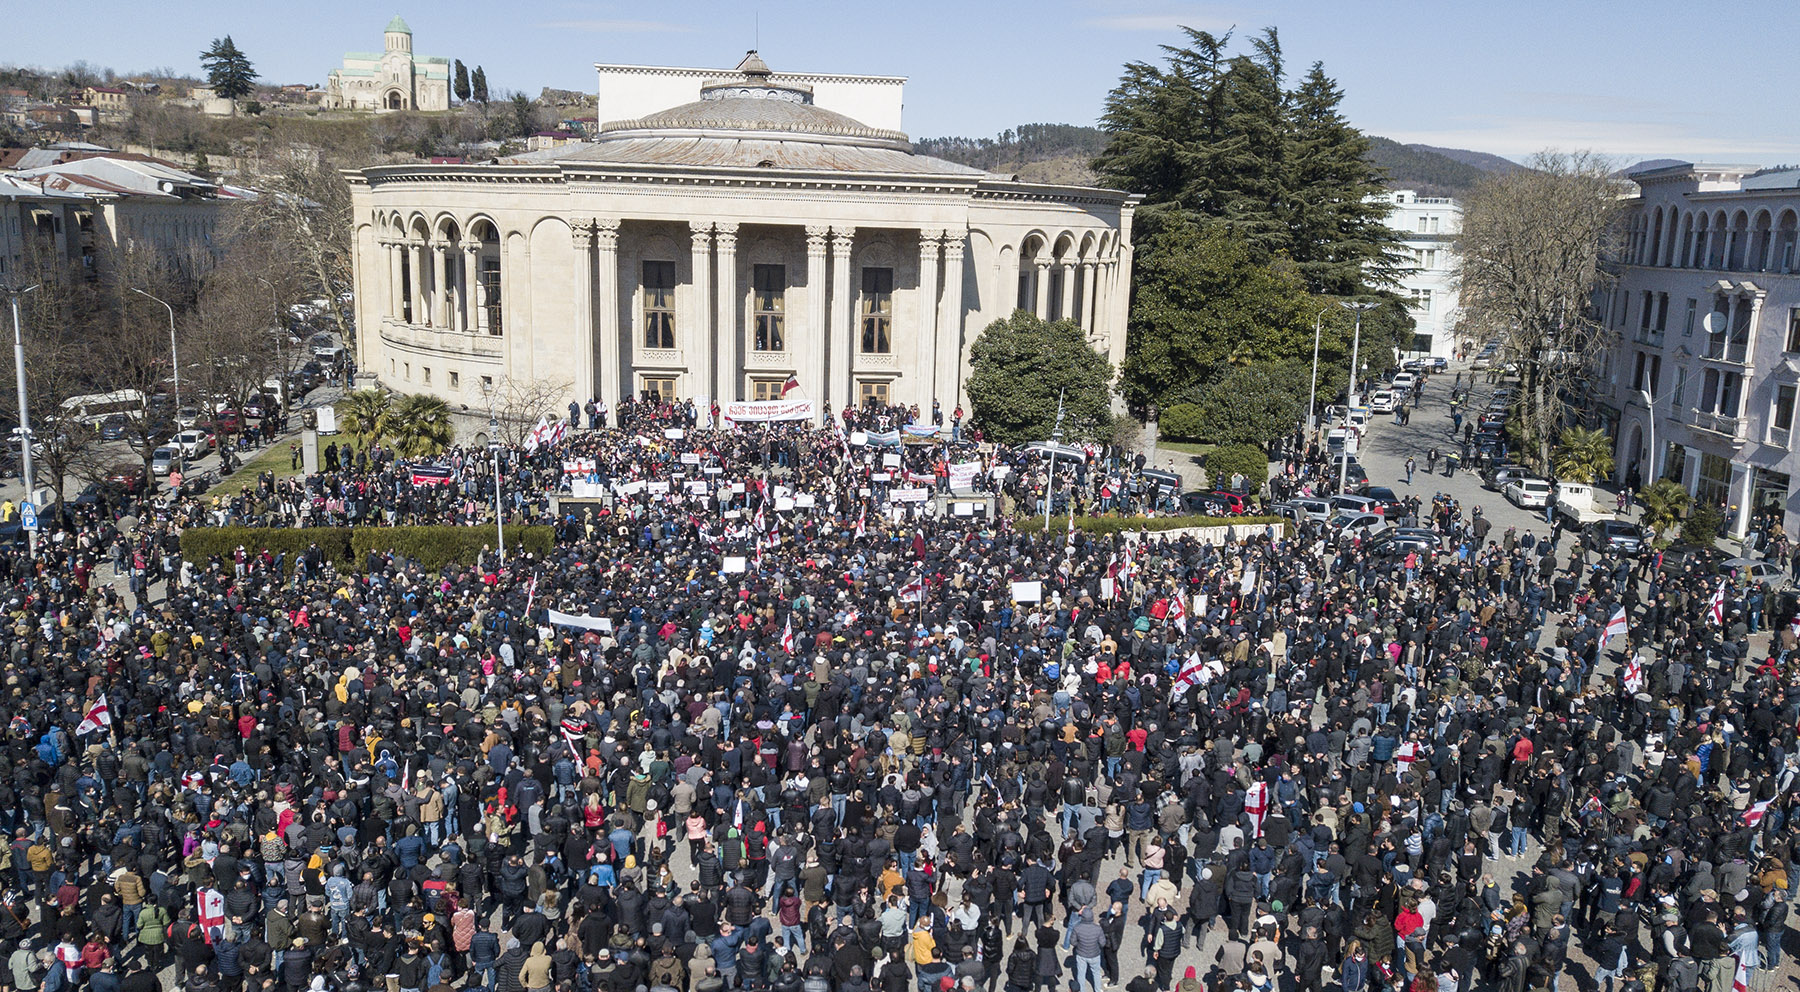 Protesters gathered in Kutaisi's central square. Photo: Mariam Nikuradze/OC Media.